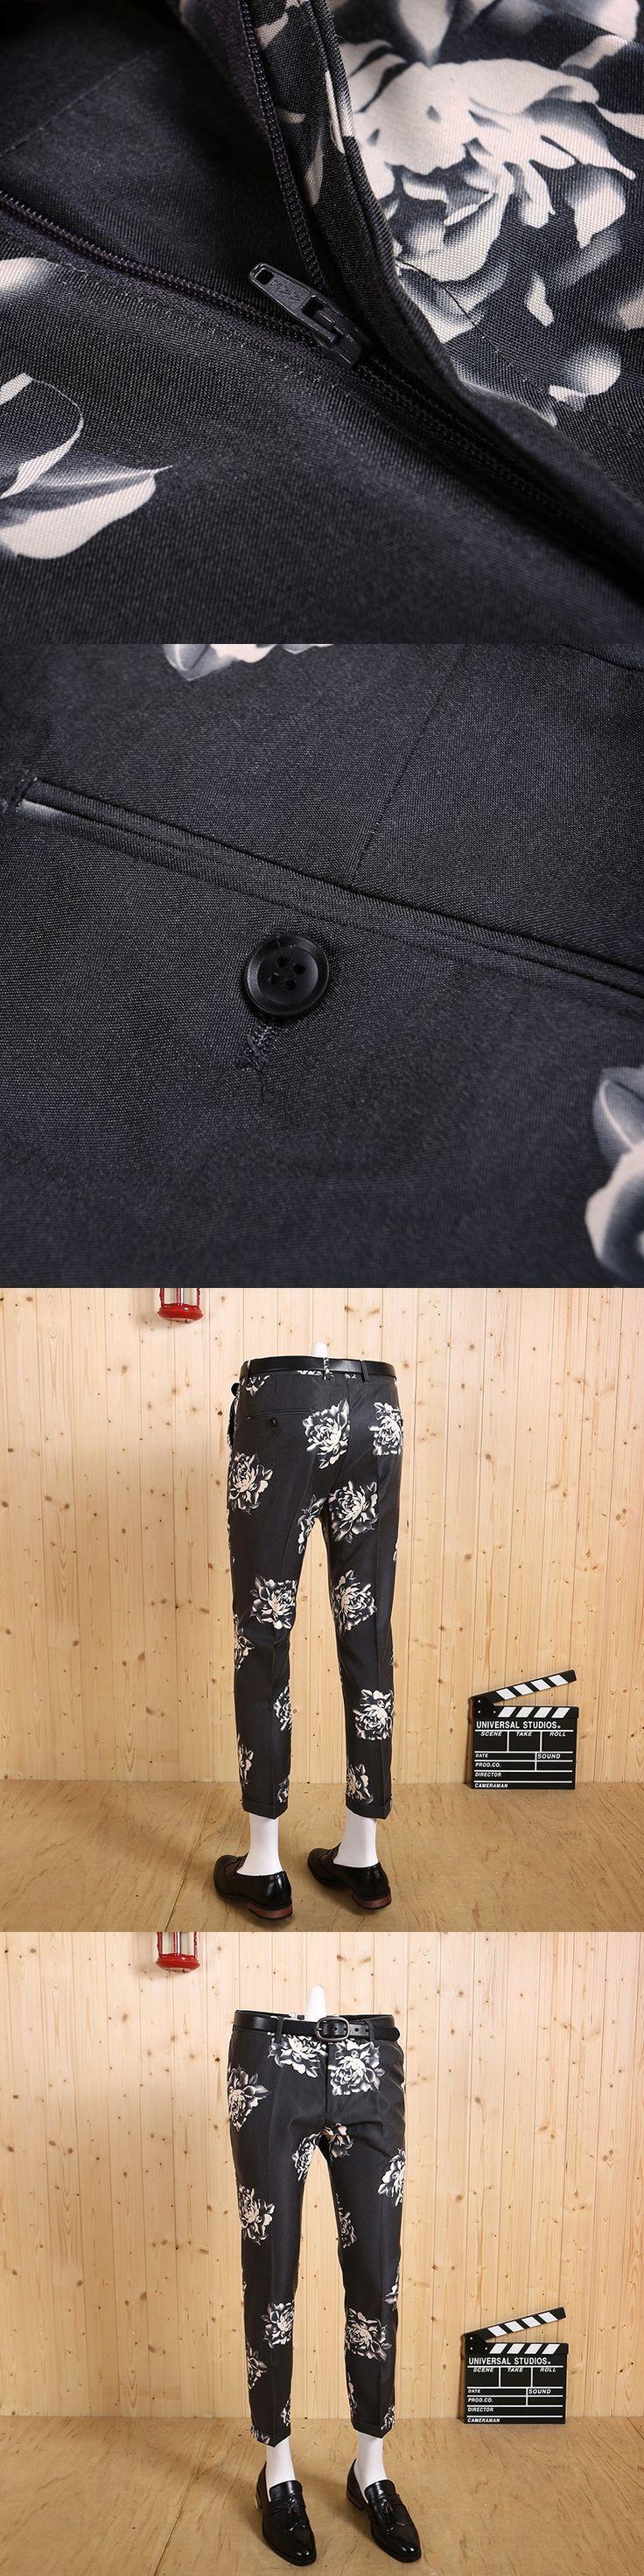 2017 new high quality men's deep grey rose printed smart super slim casual slim business wedding groom suits pants man pant